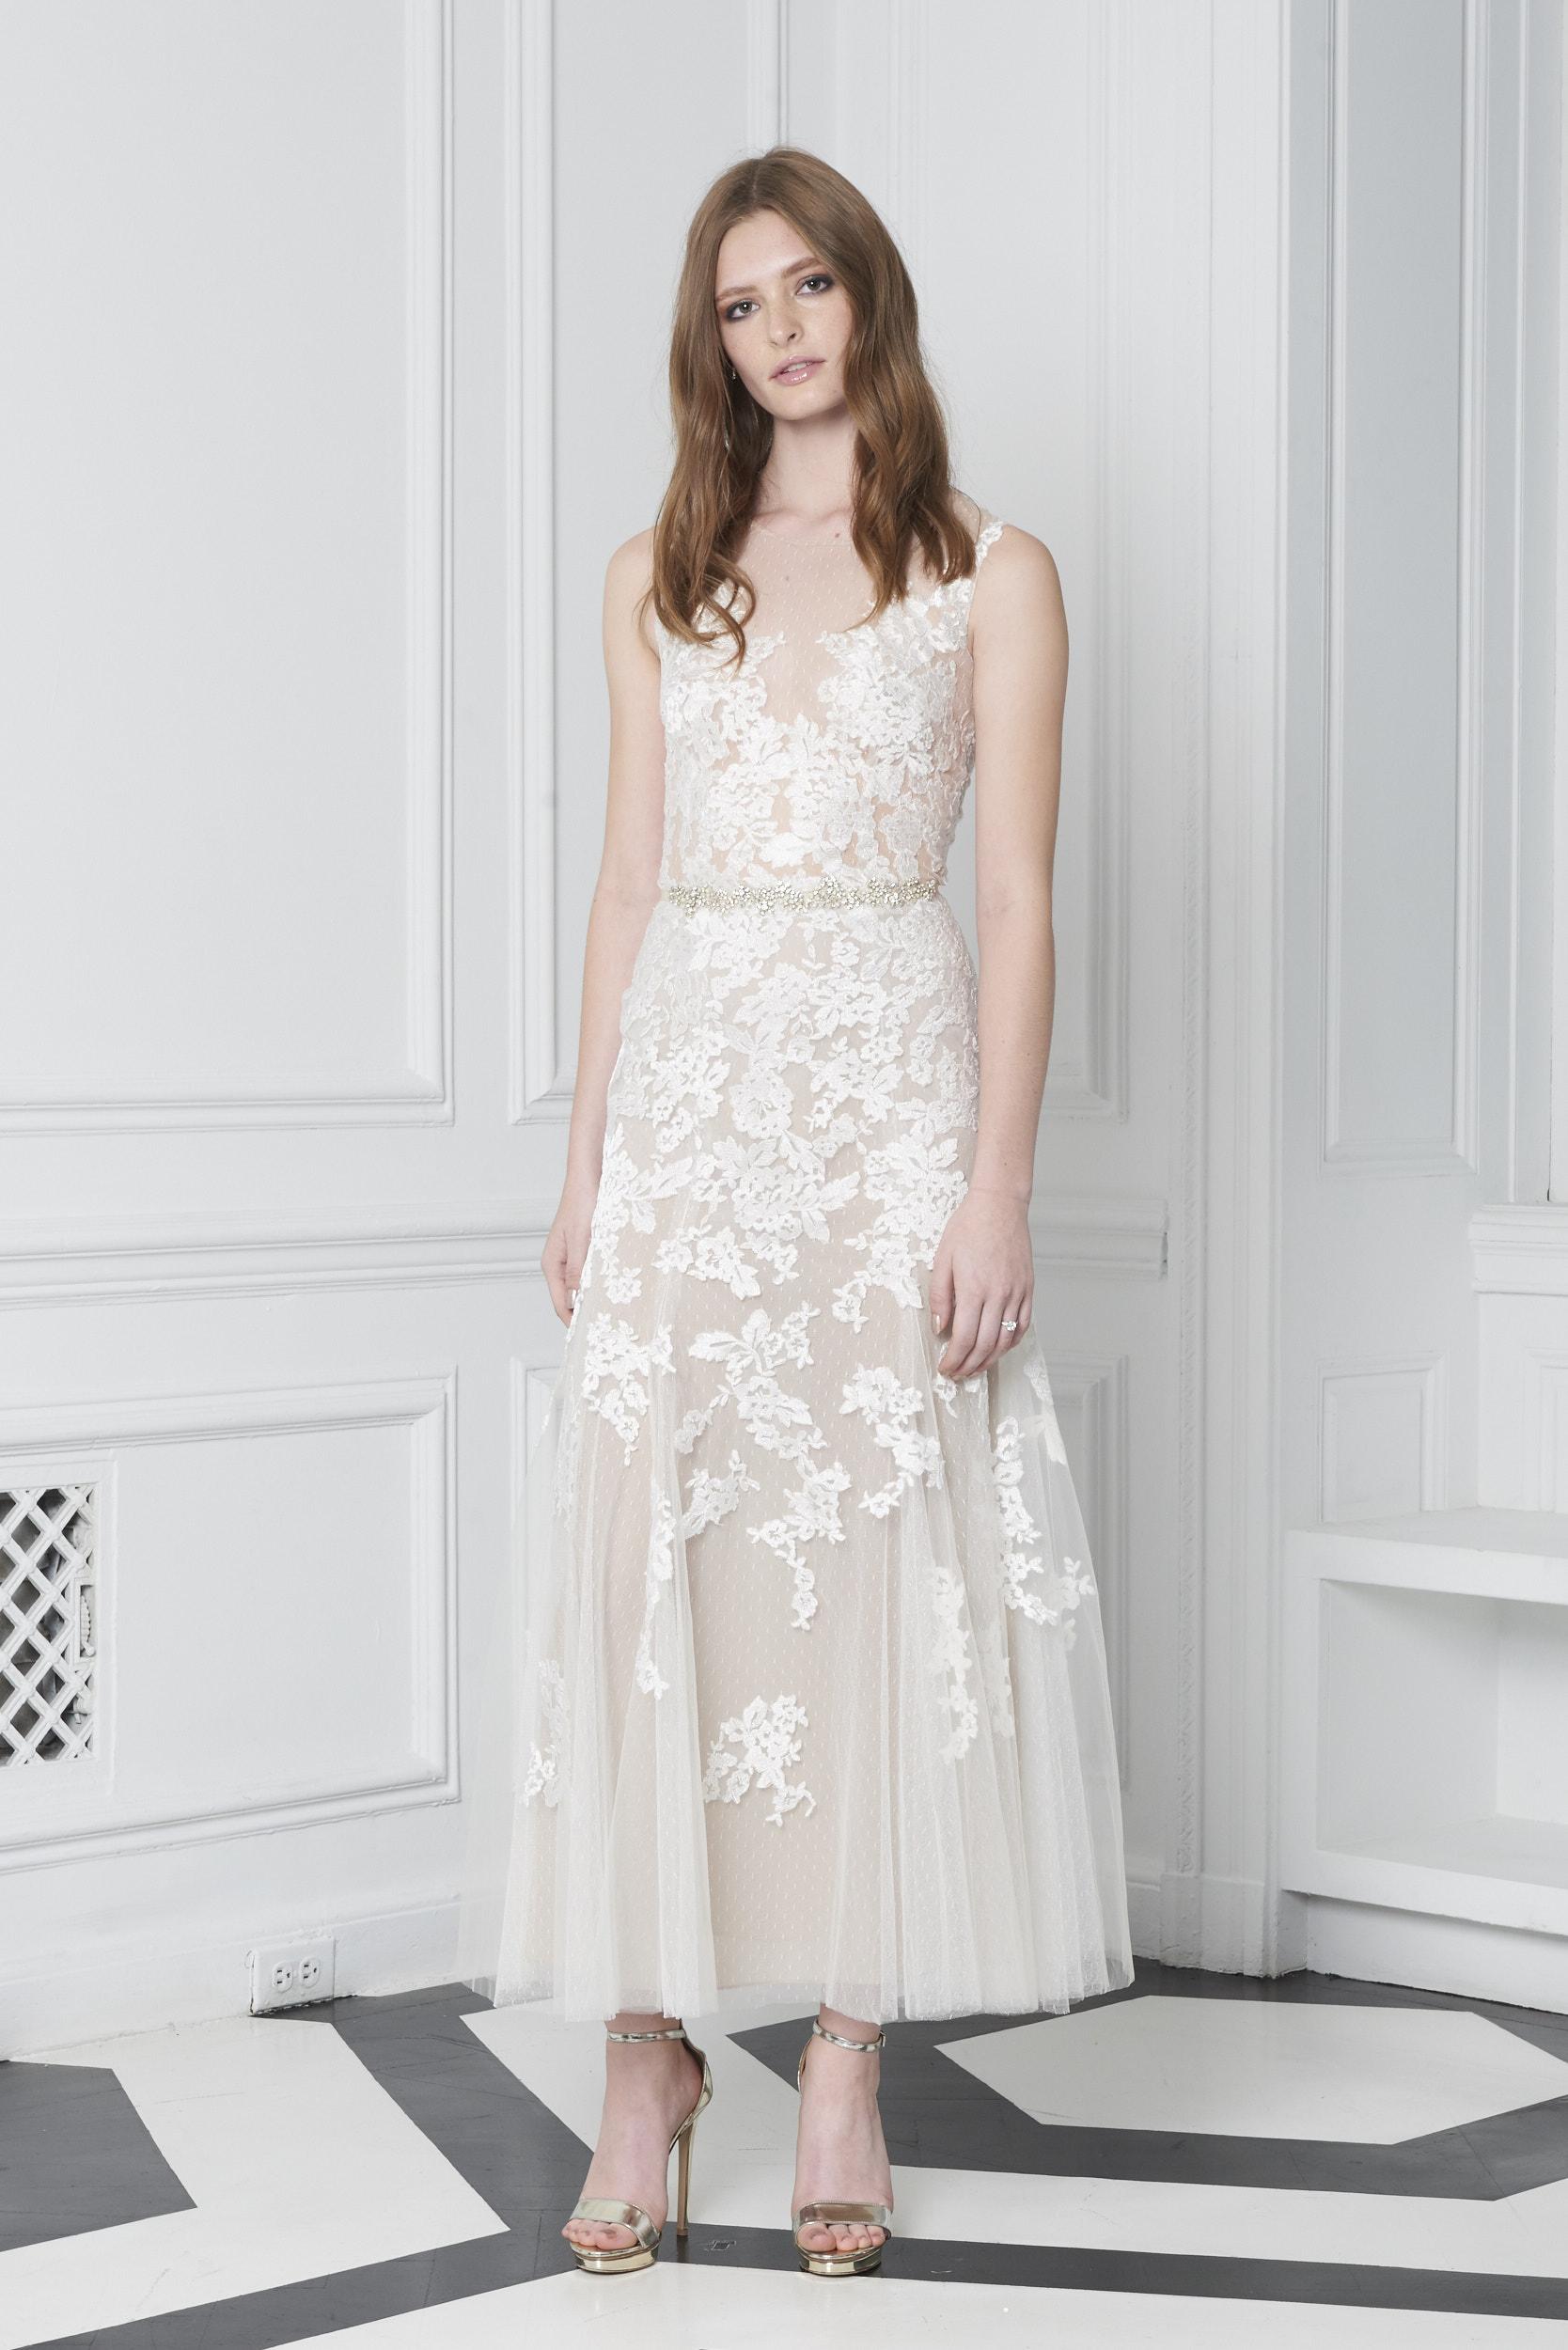 Monique Lhuillier Bliss Fall 2018 Tea-Length Embroidered A-Line Wedding Dress